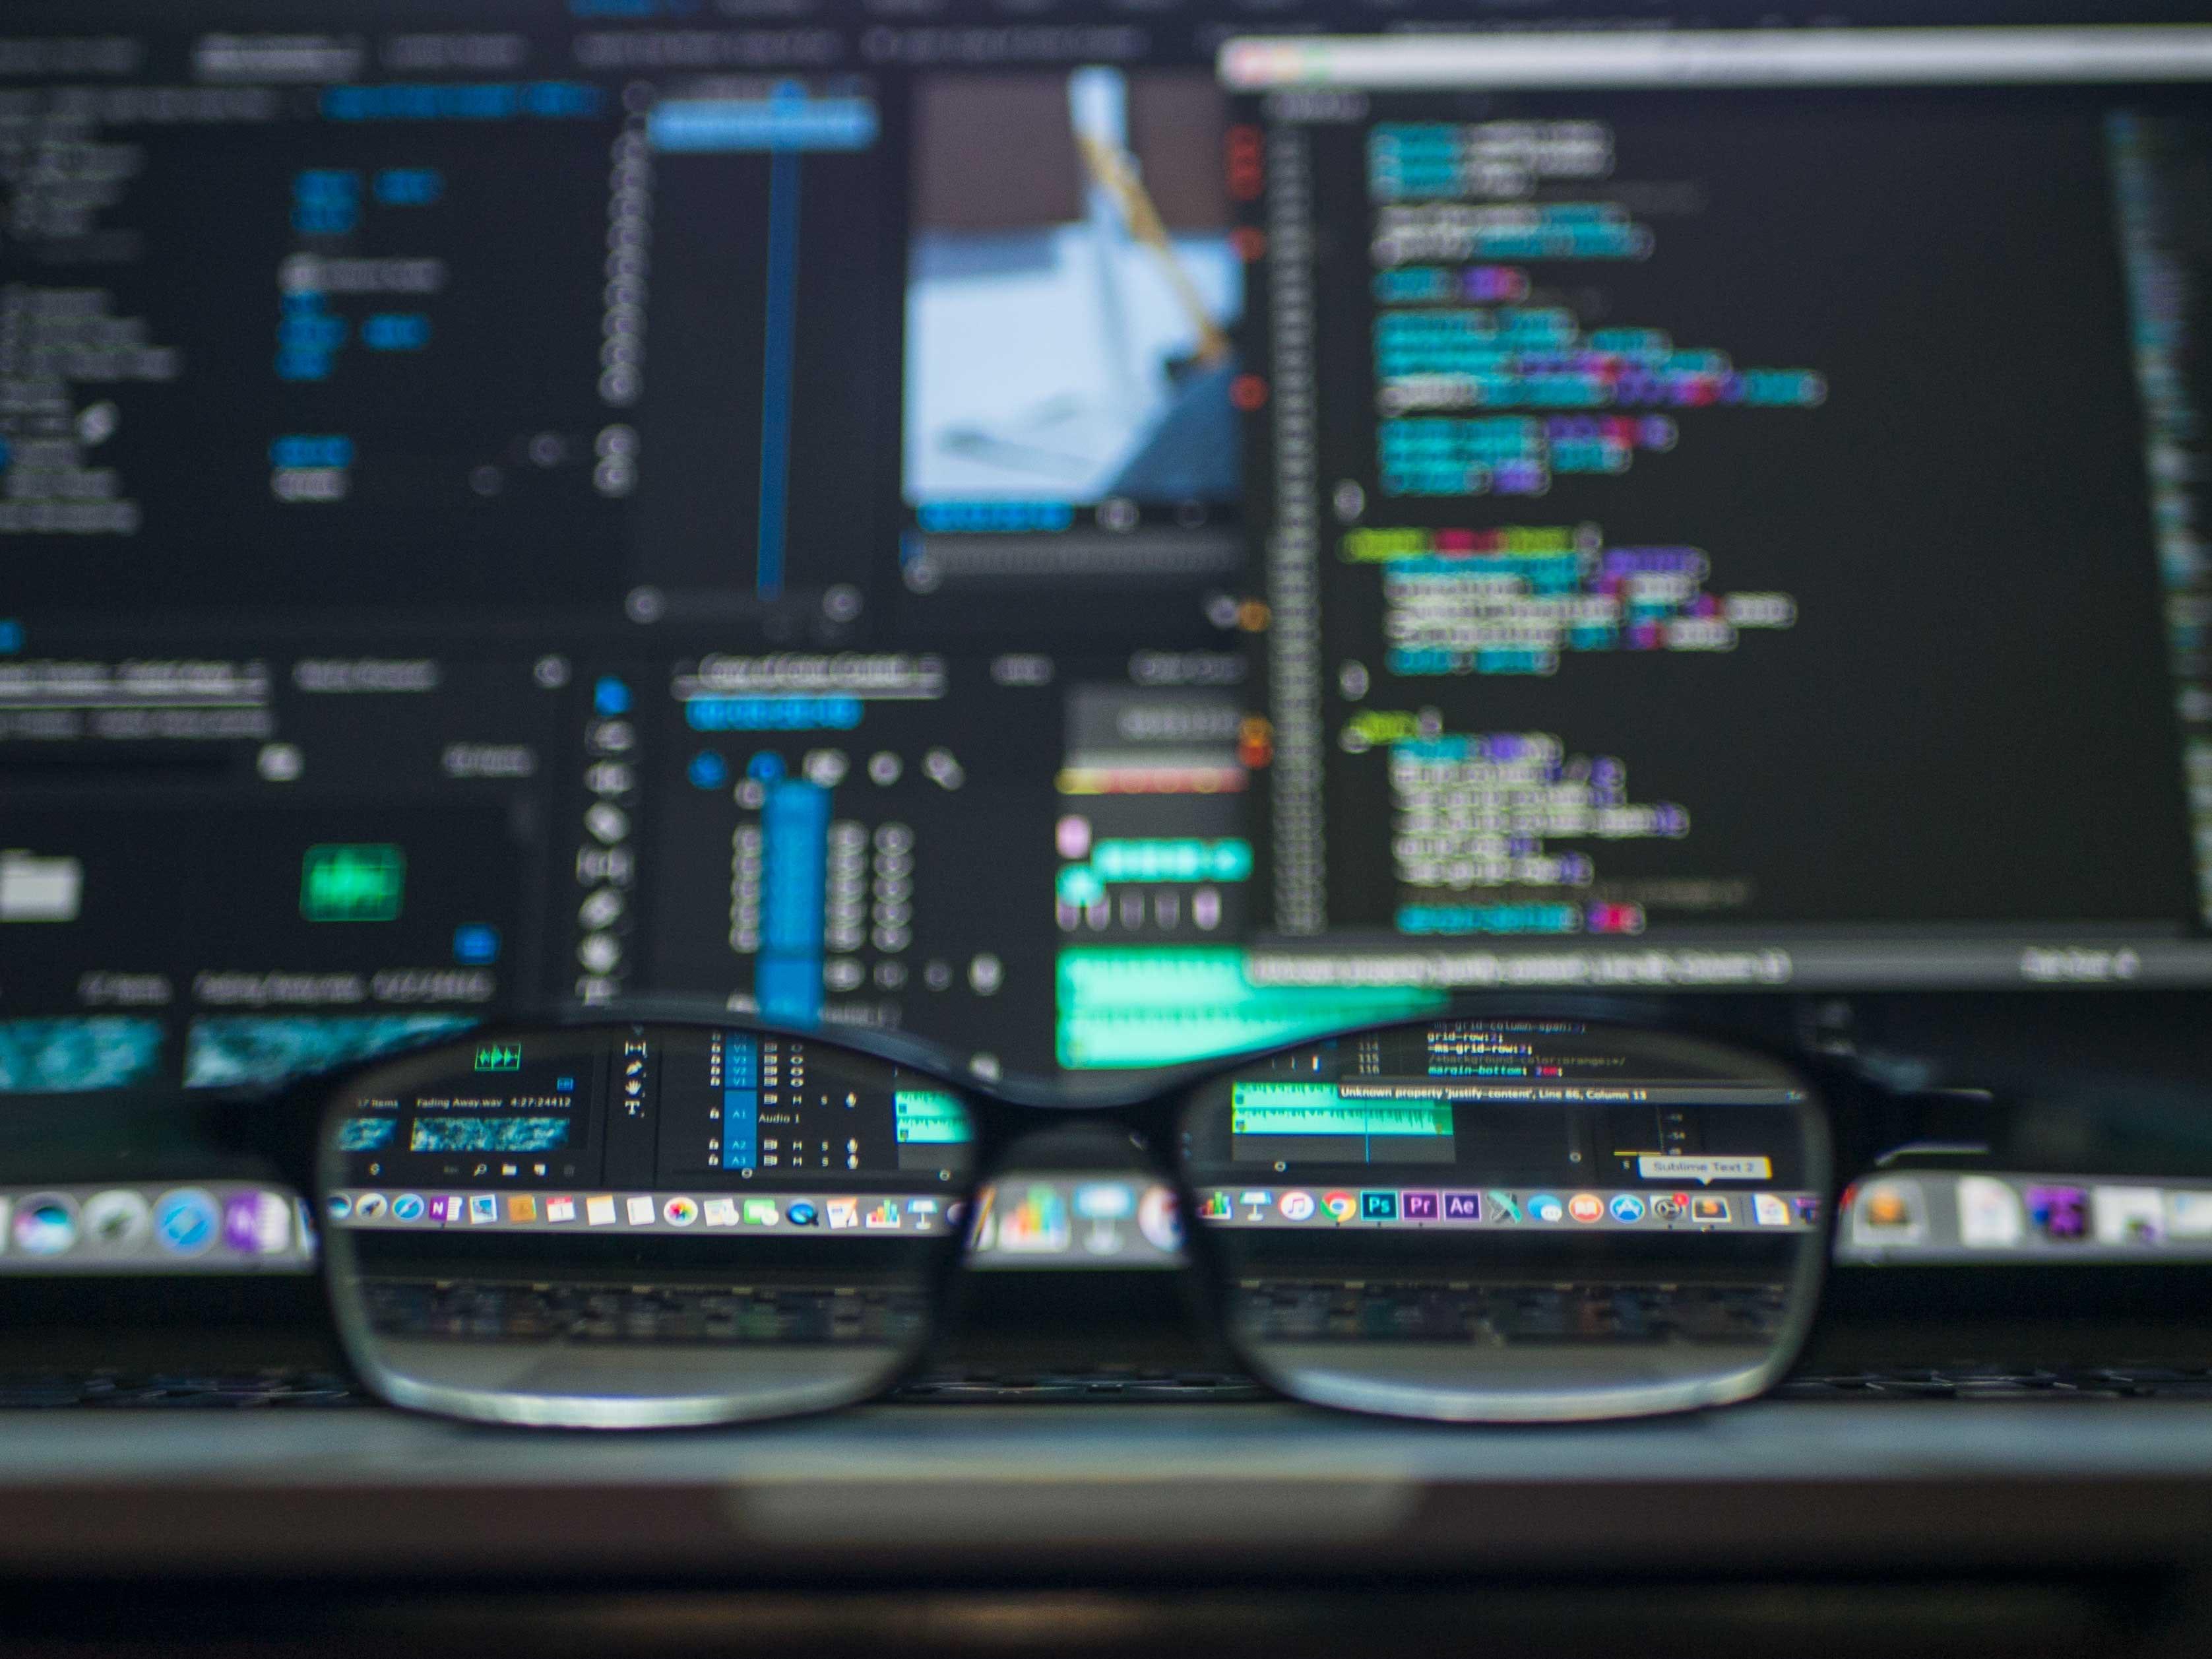 Web Designer plays a Major Role